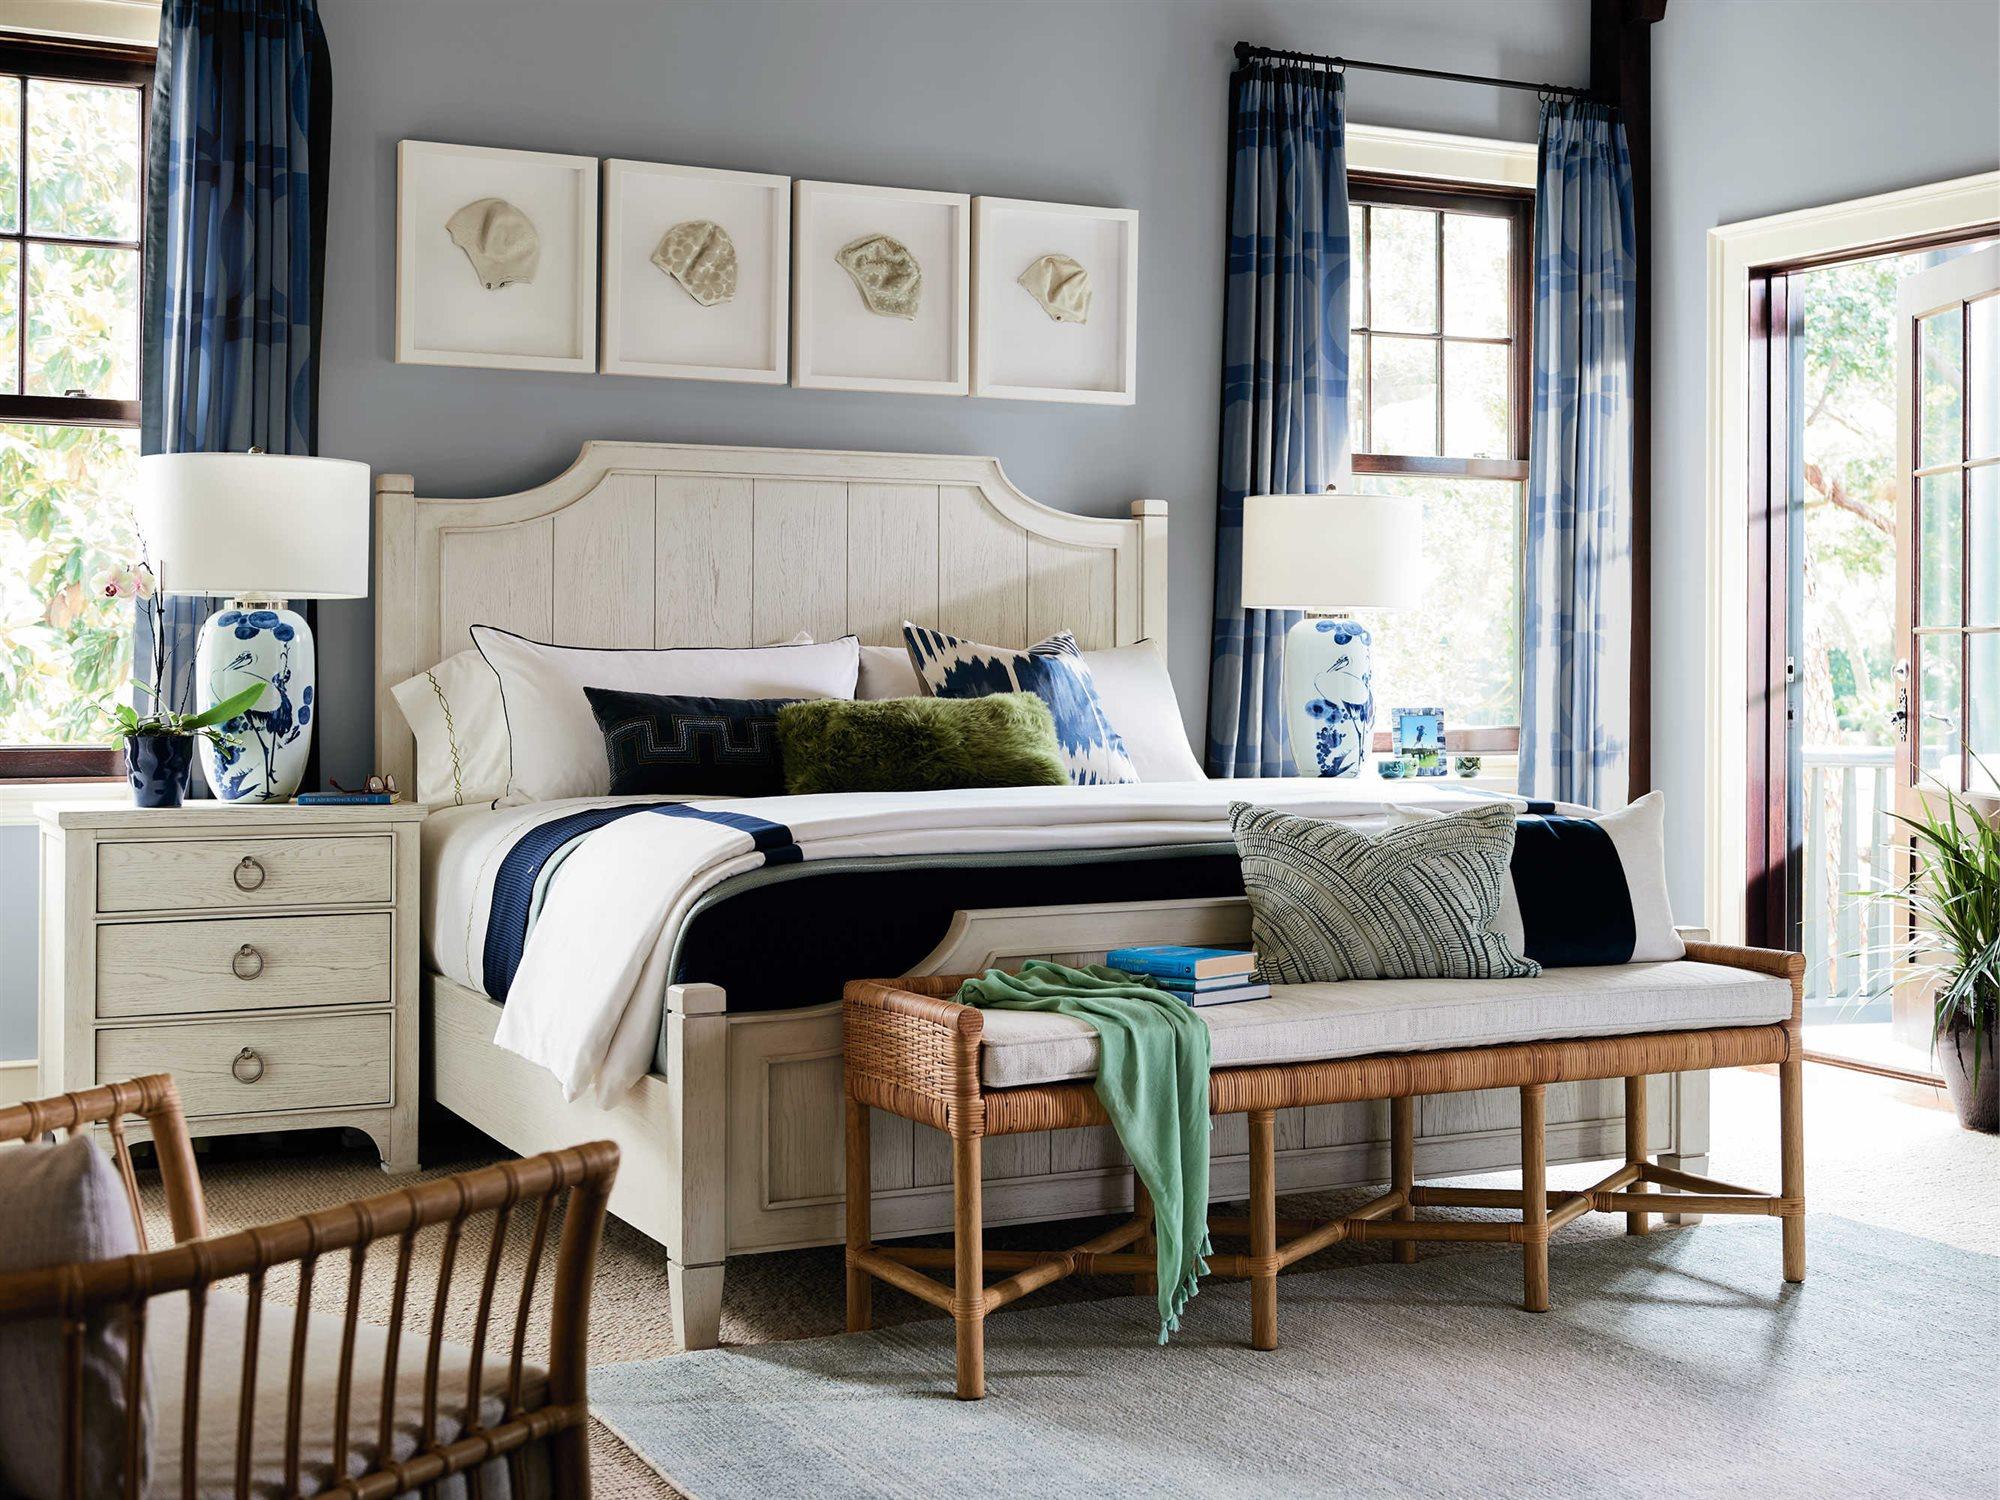 Universal Furniture Coastal Living Bedroom Set Uf833250bset